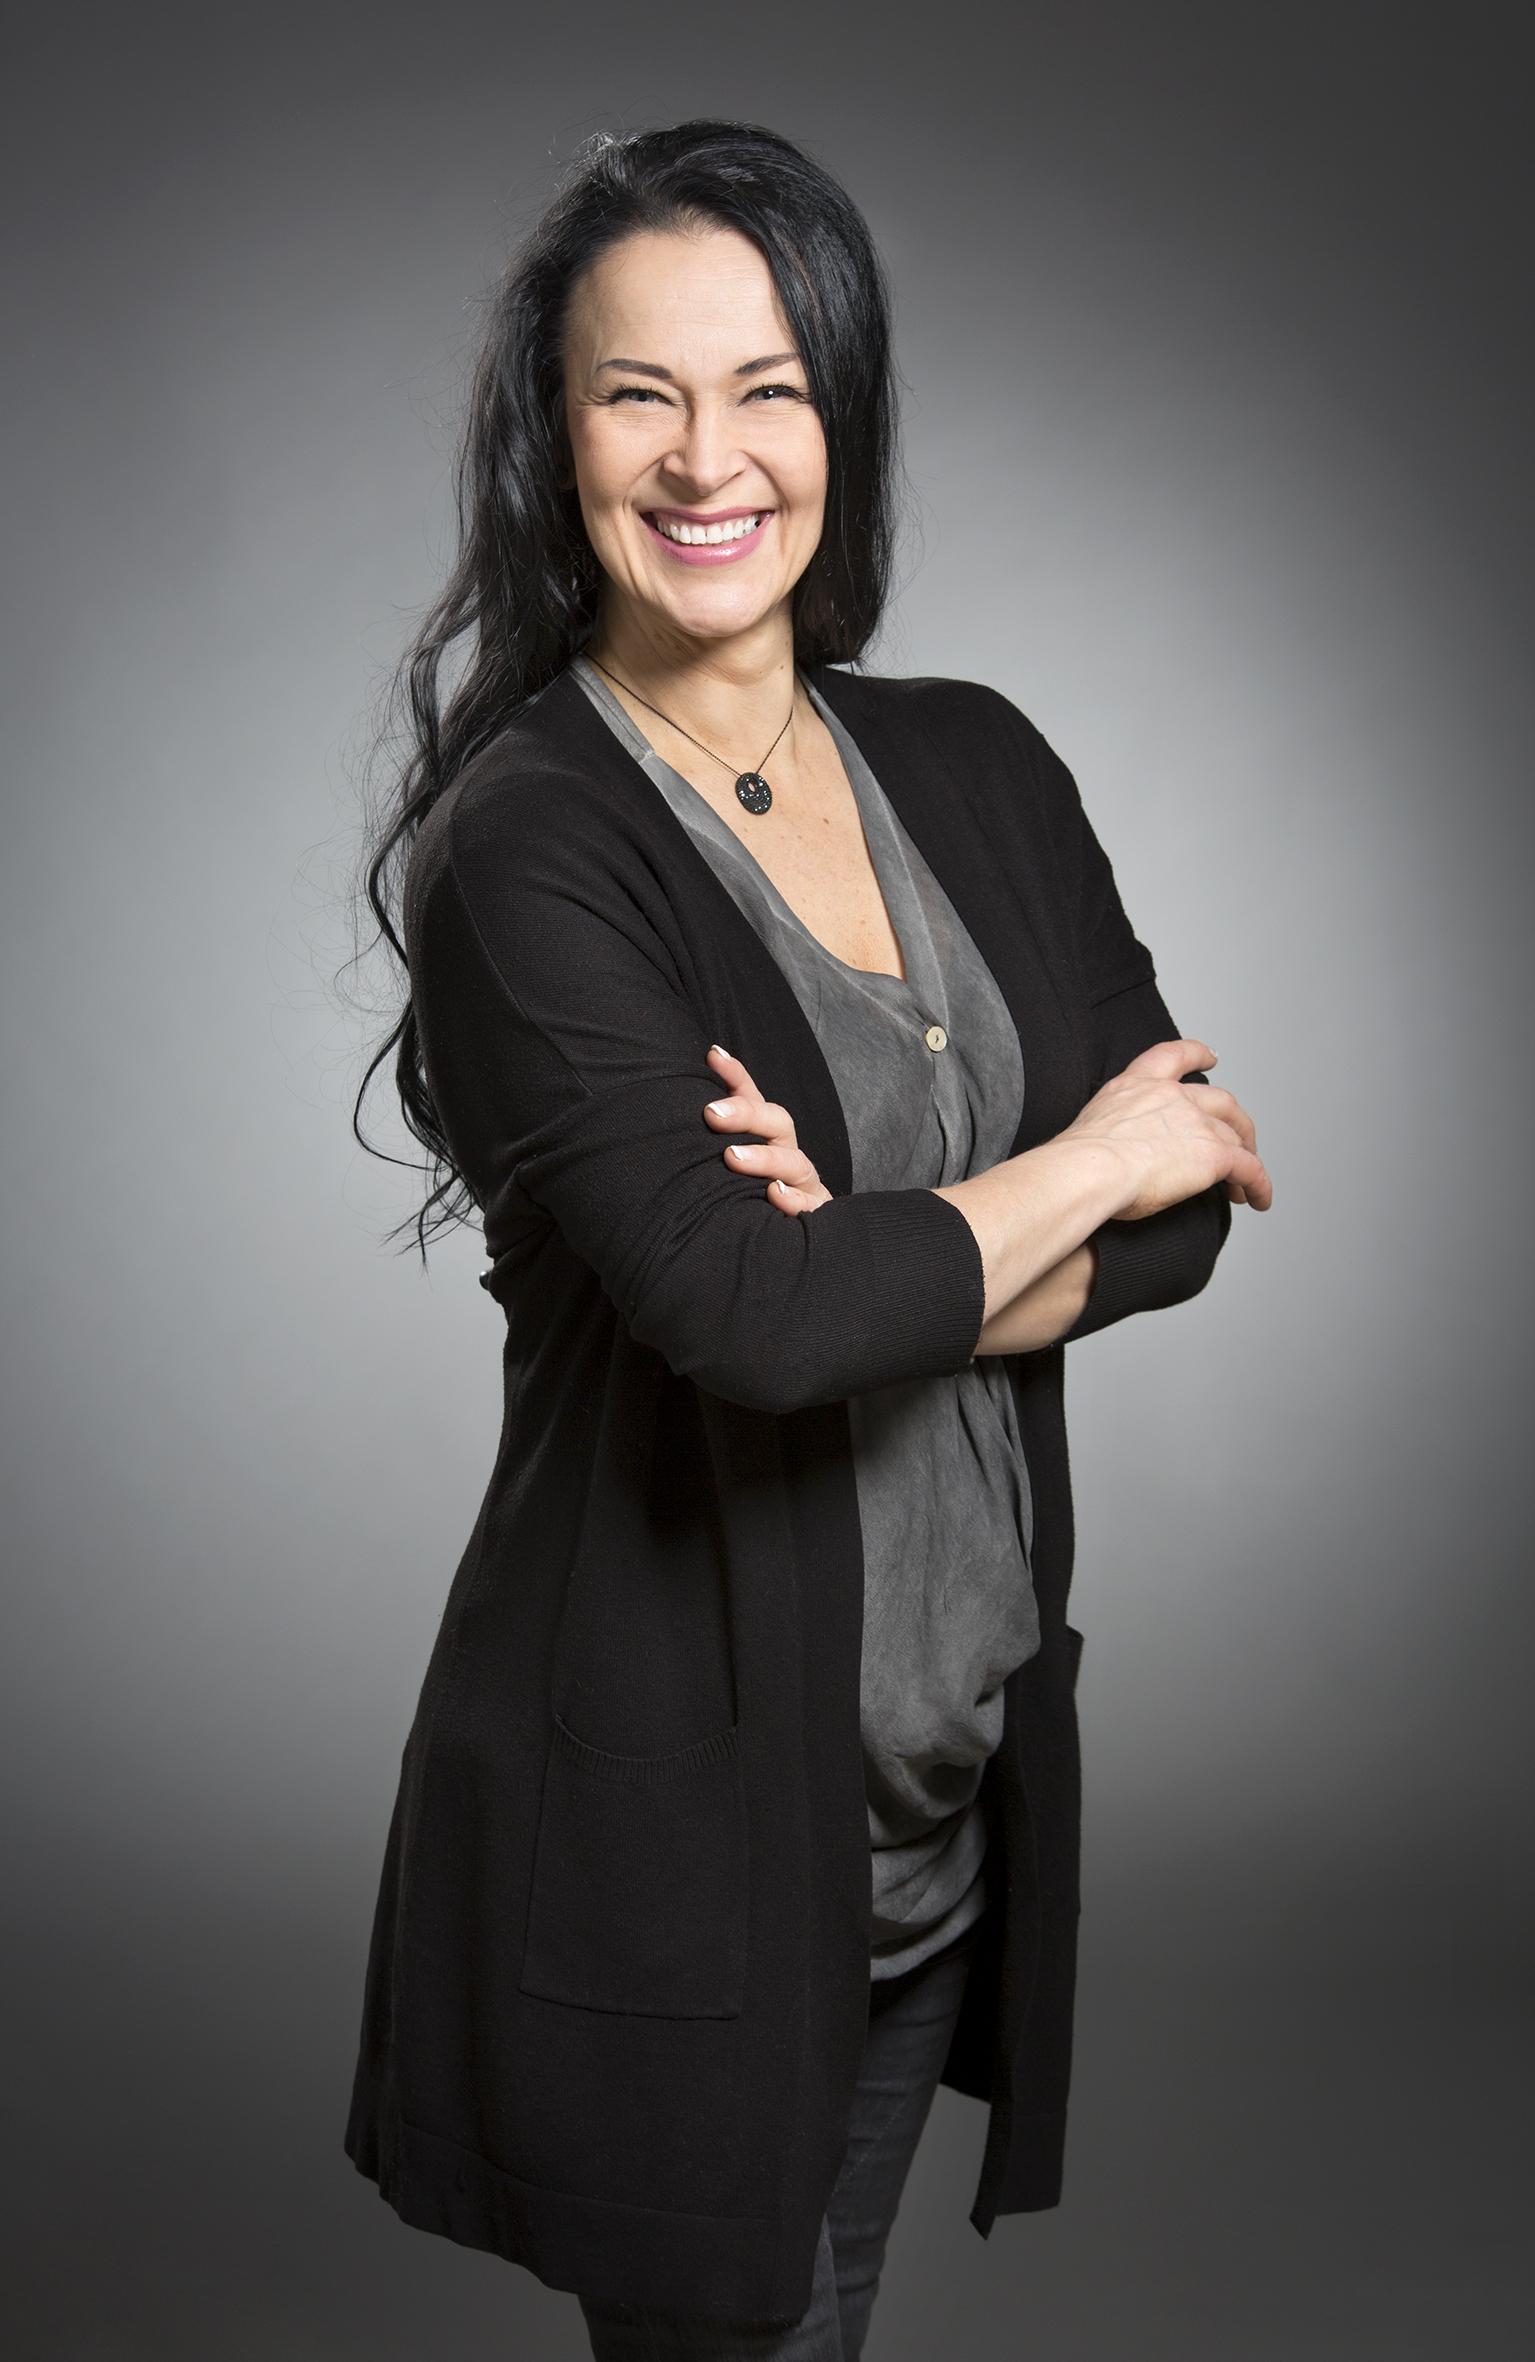 Eila Kaitokari